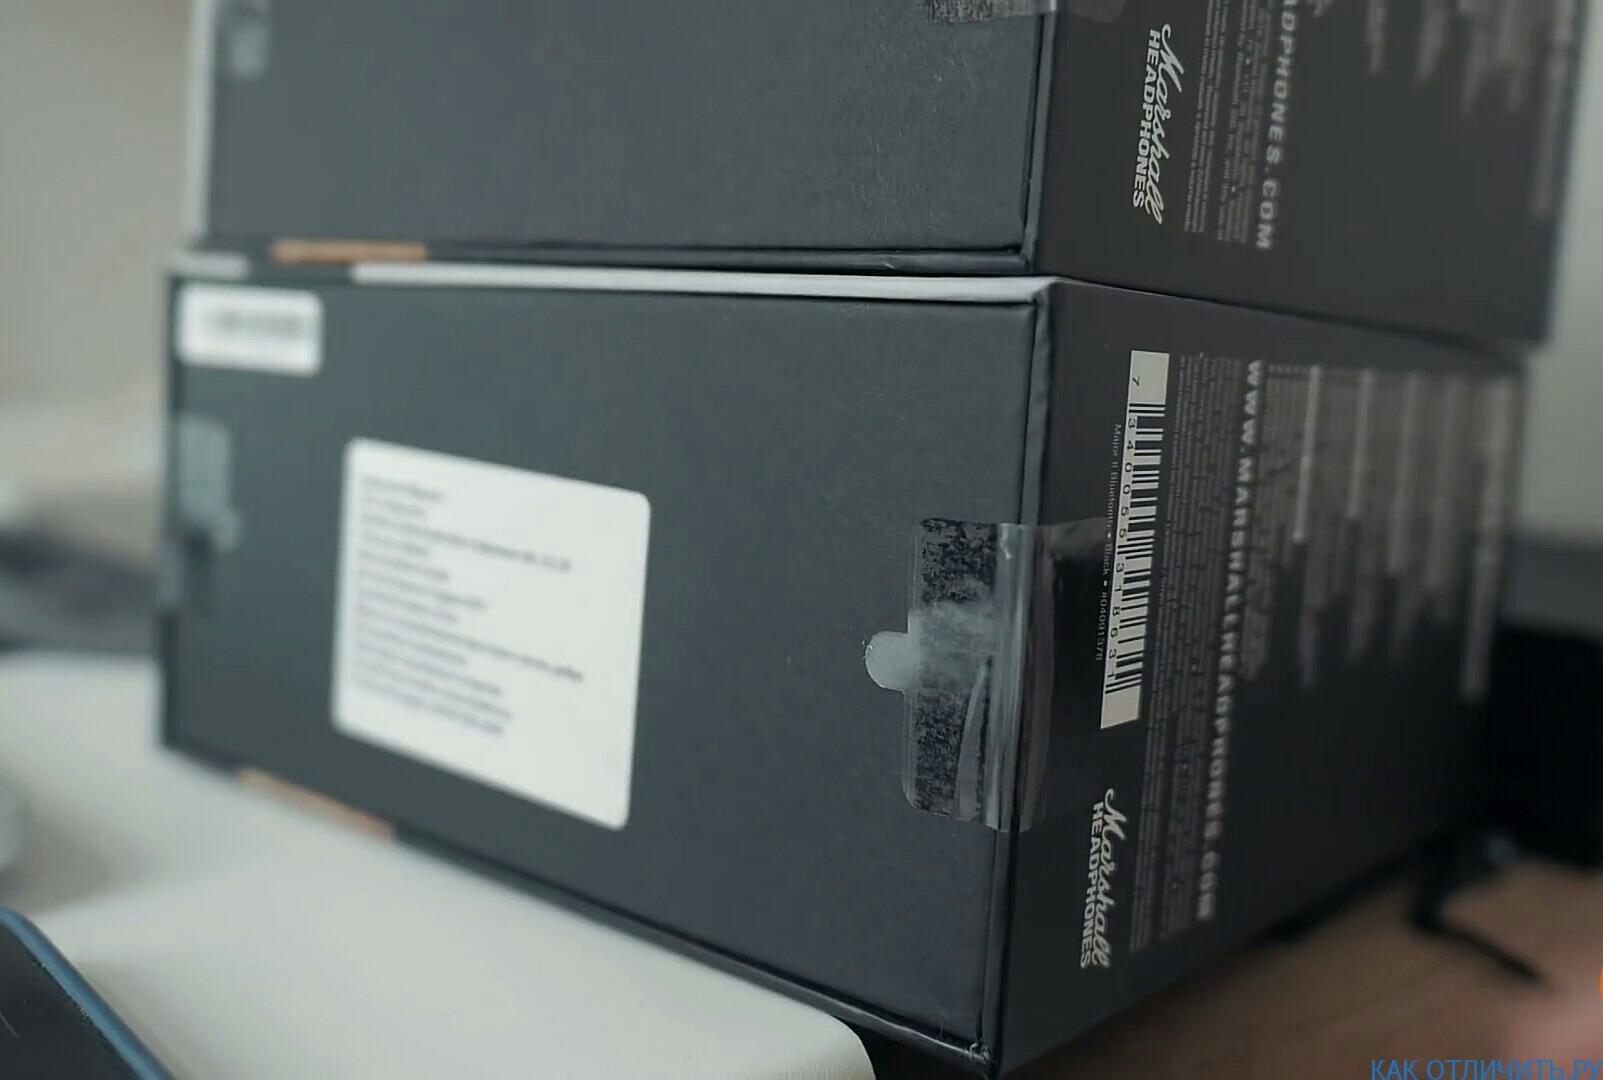 Фиксация коробки прозрачной наклейкой